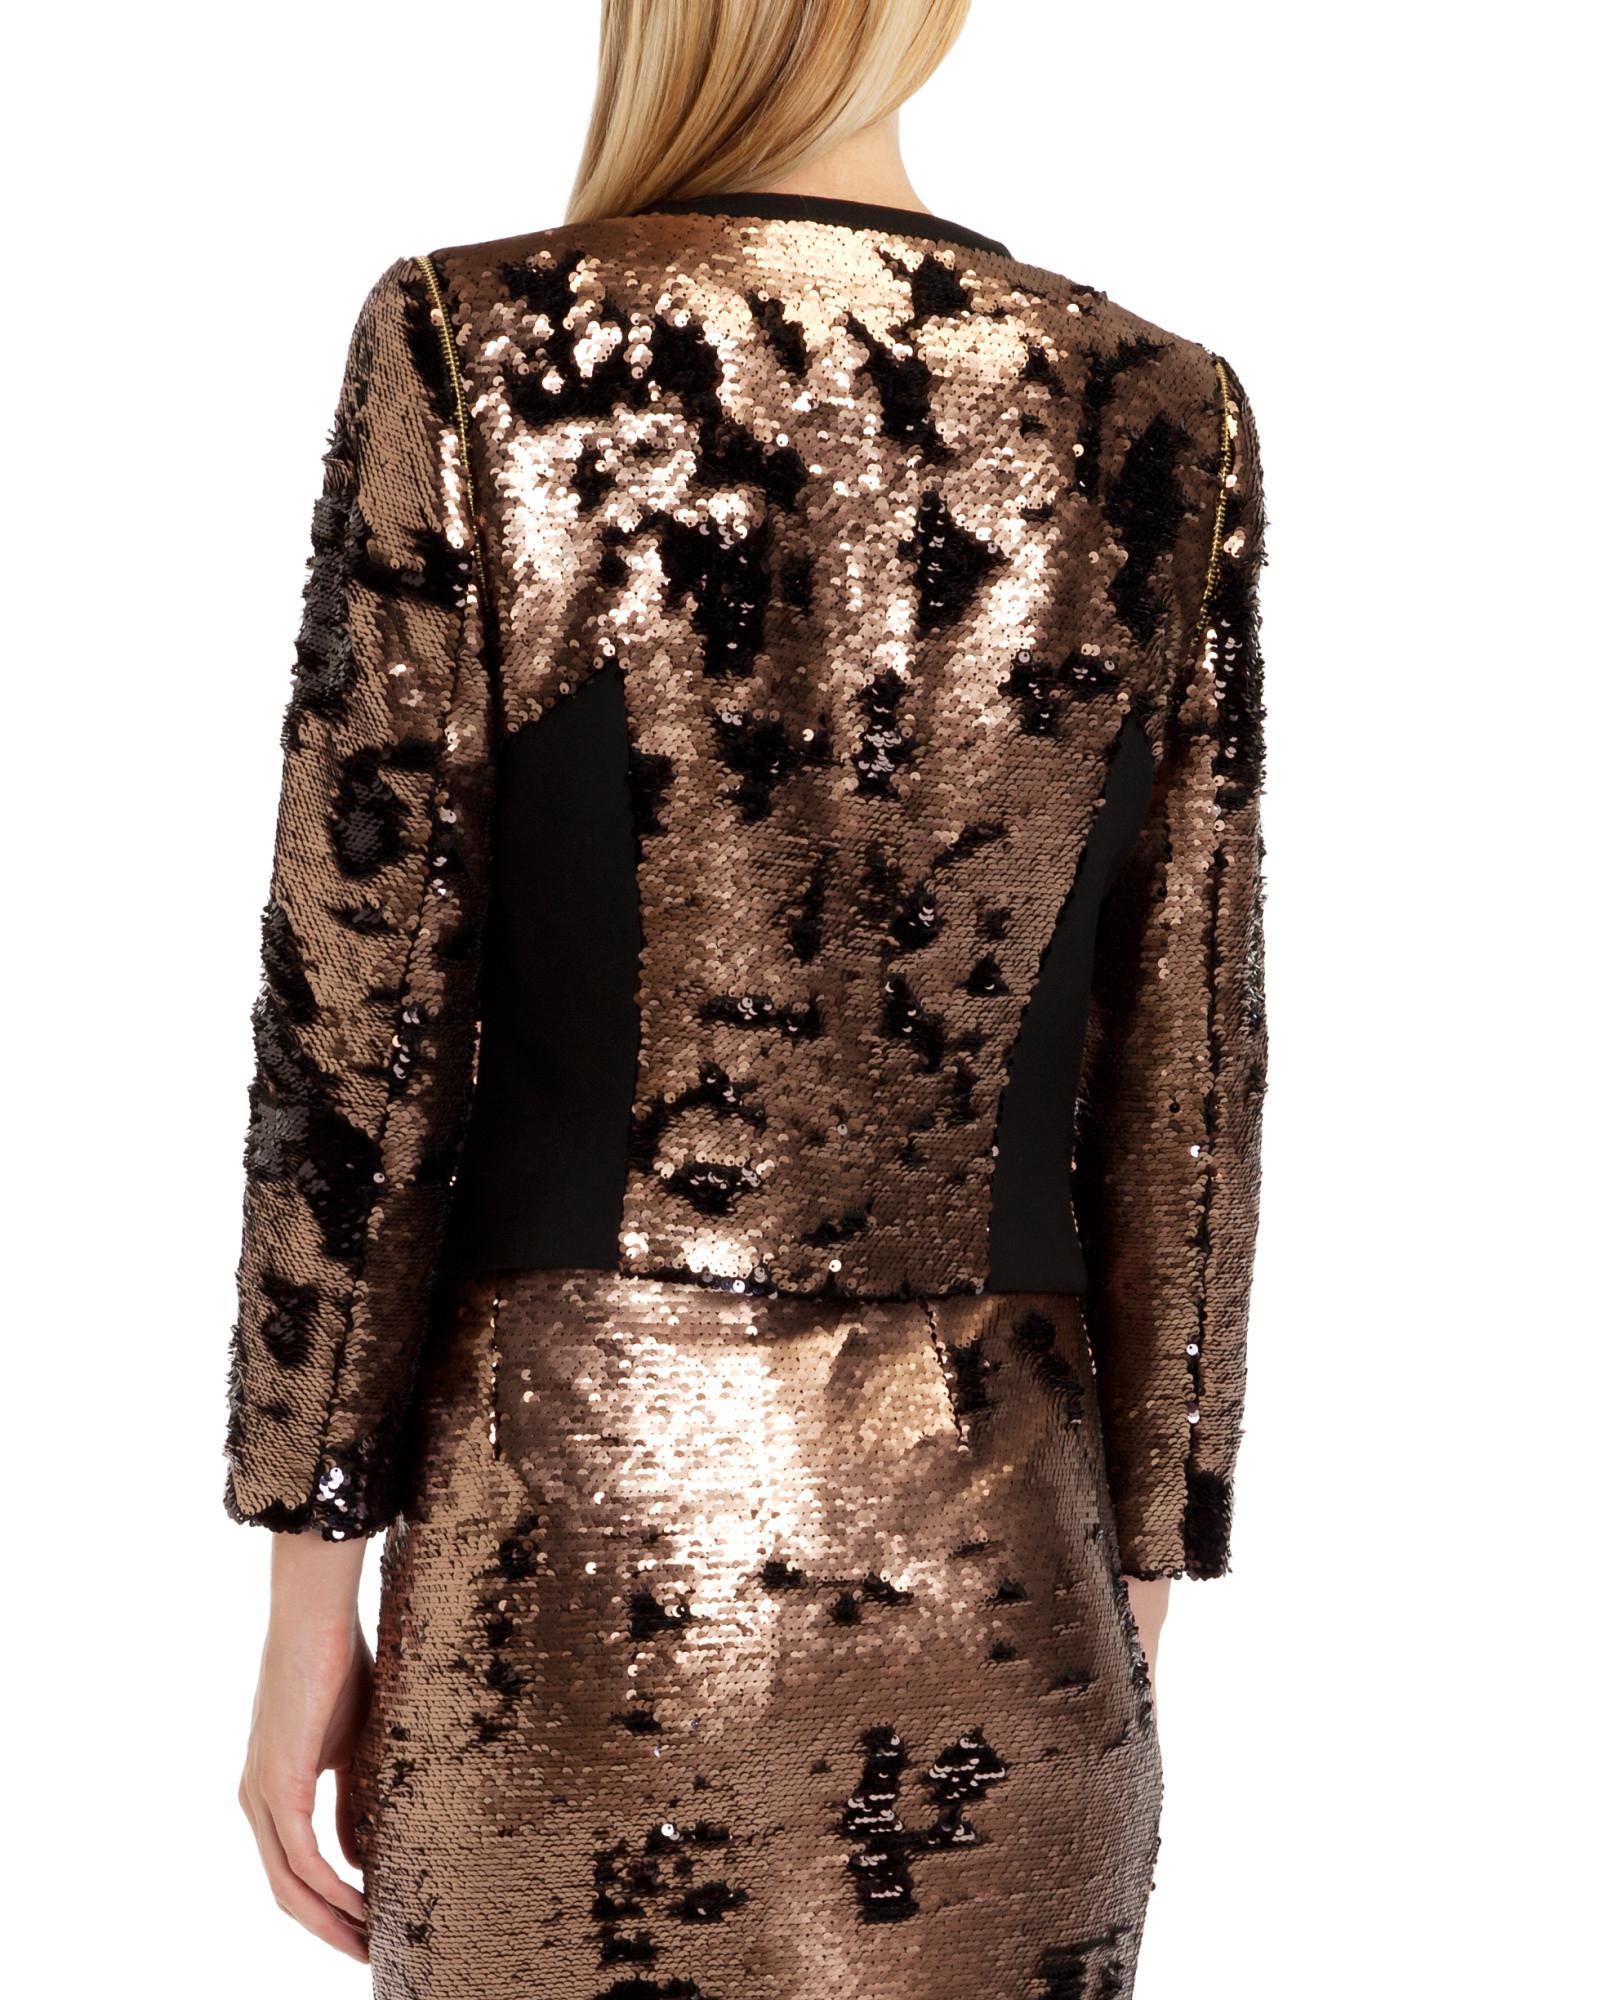 7afa5ac82179bf Ted Baker Blubele Sequin Jacket in Metallic - Lyst